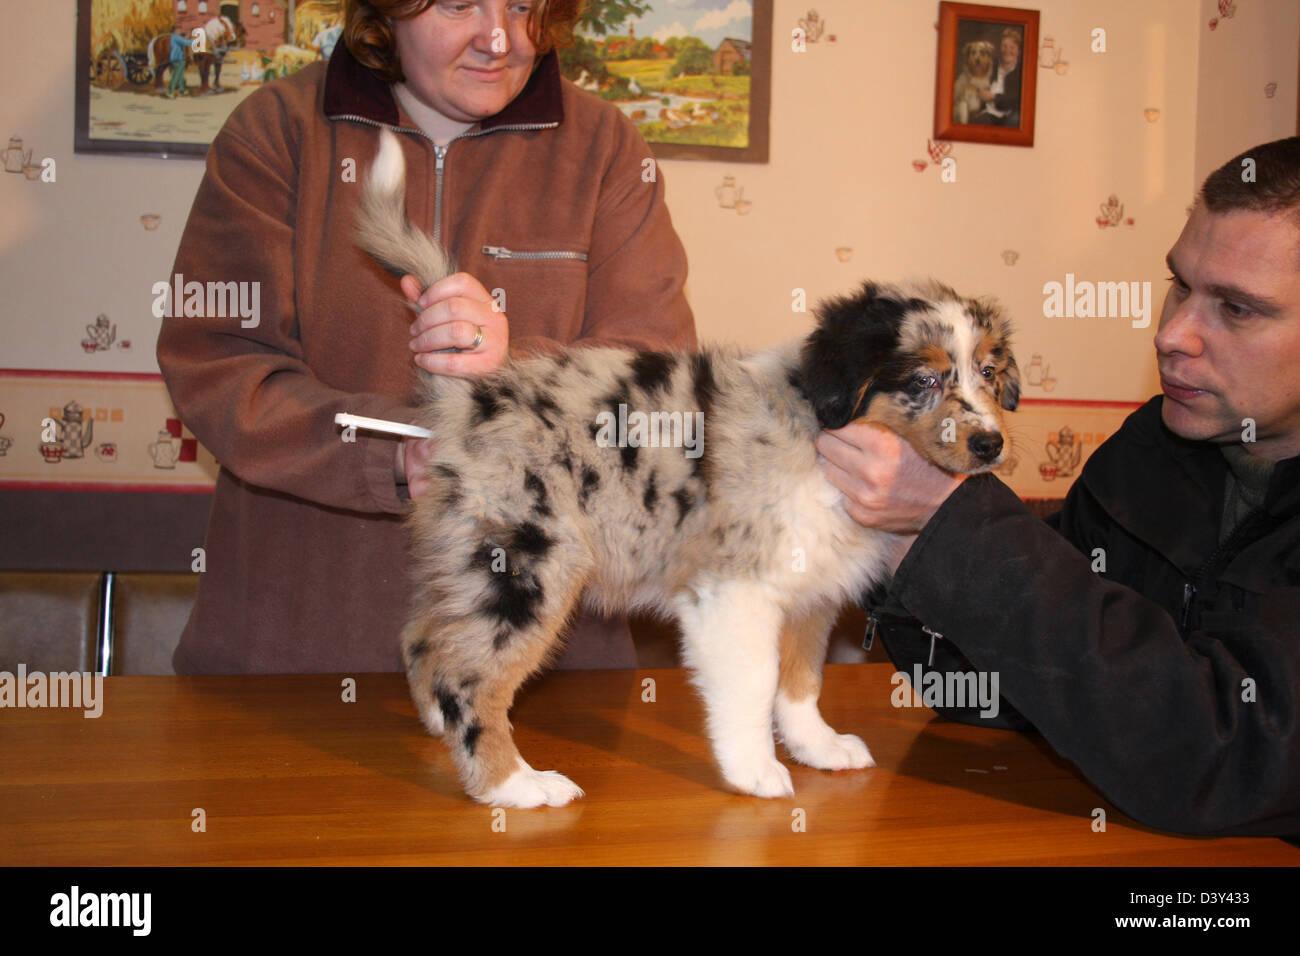 Veterinary taking temperature to a Dog Australian shepherd / Aussie - Stock Image